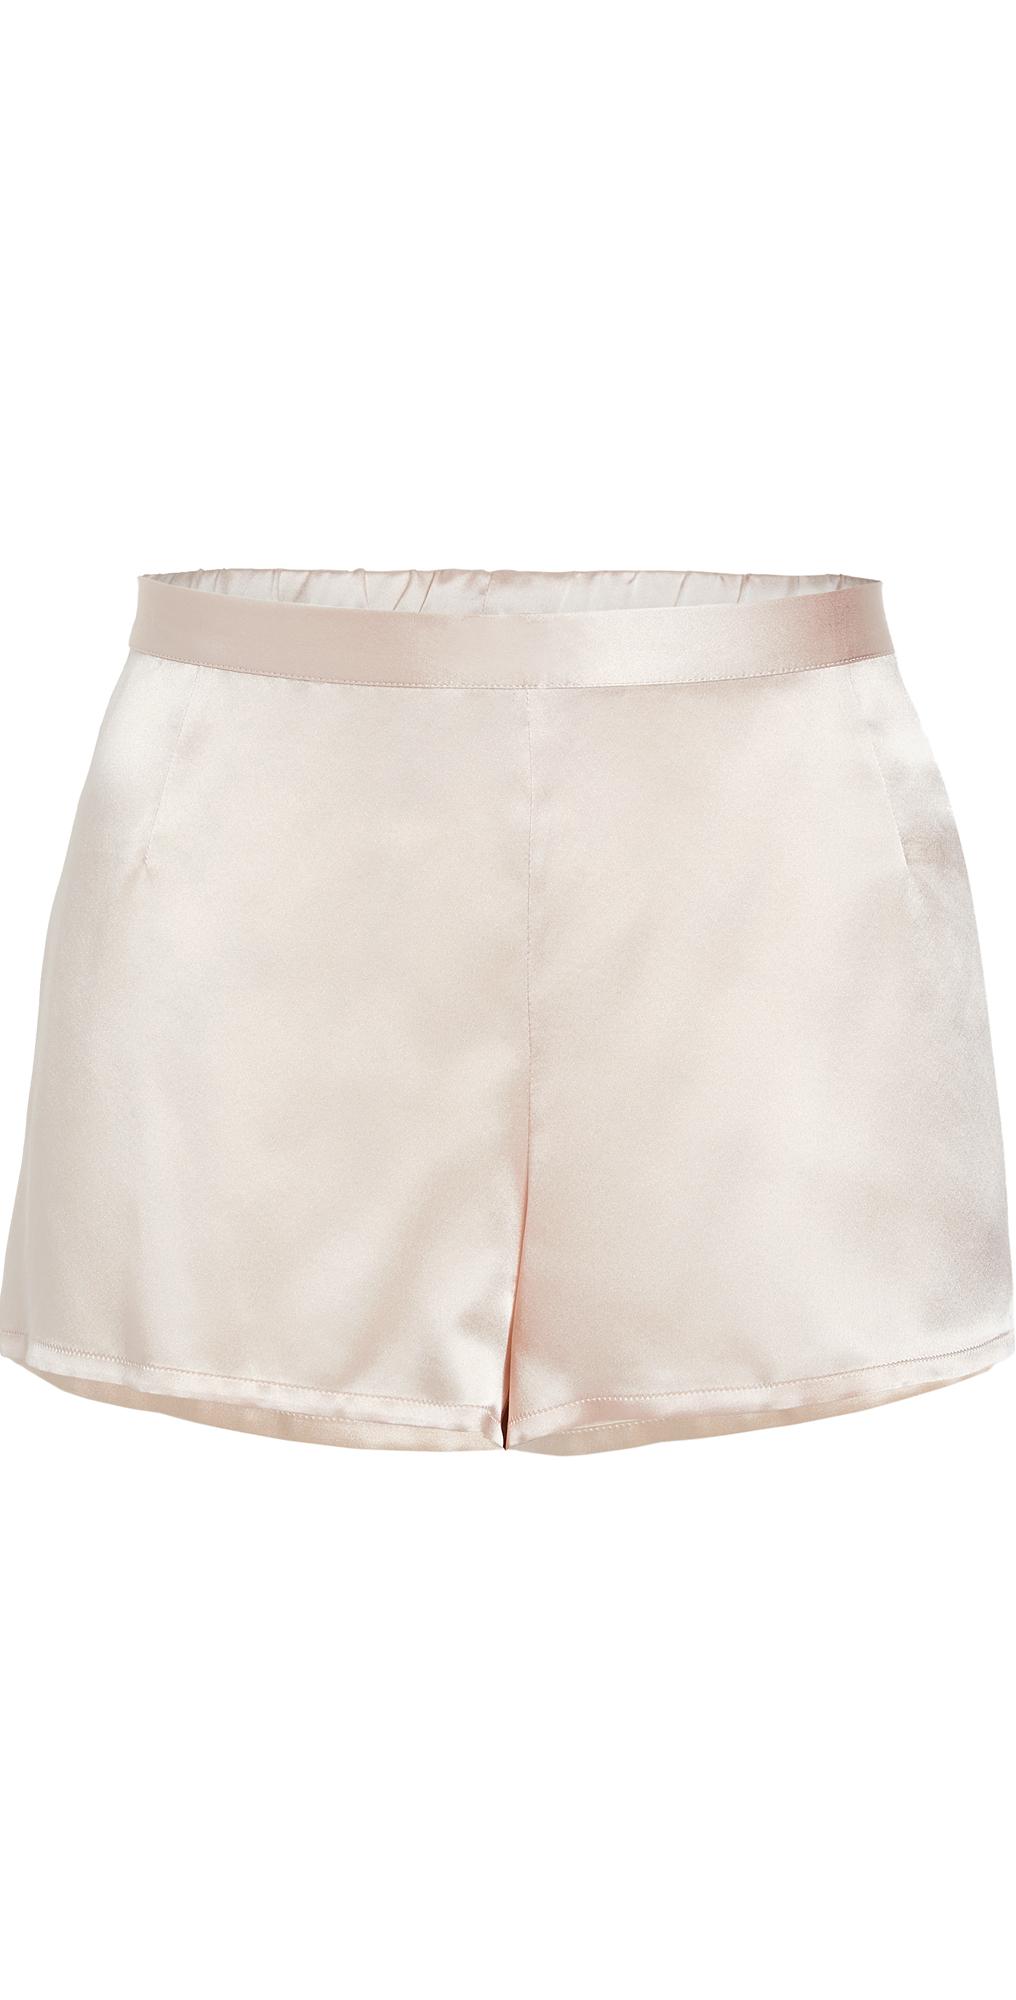 La Perla Silk Shorts